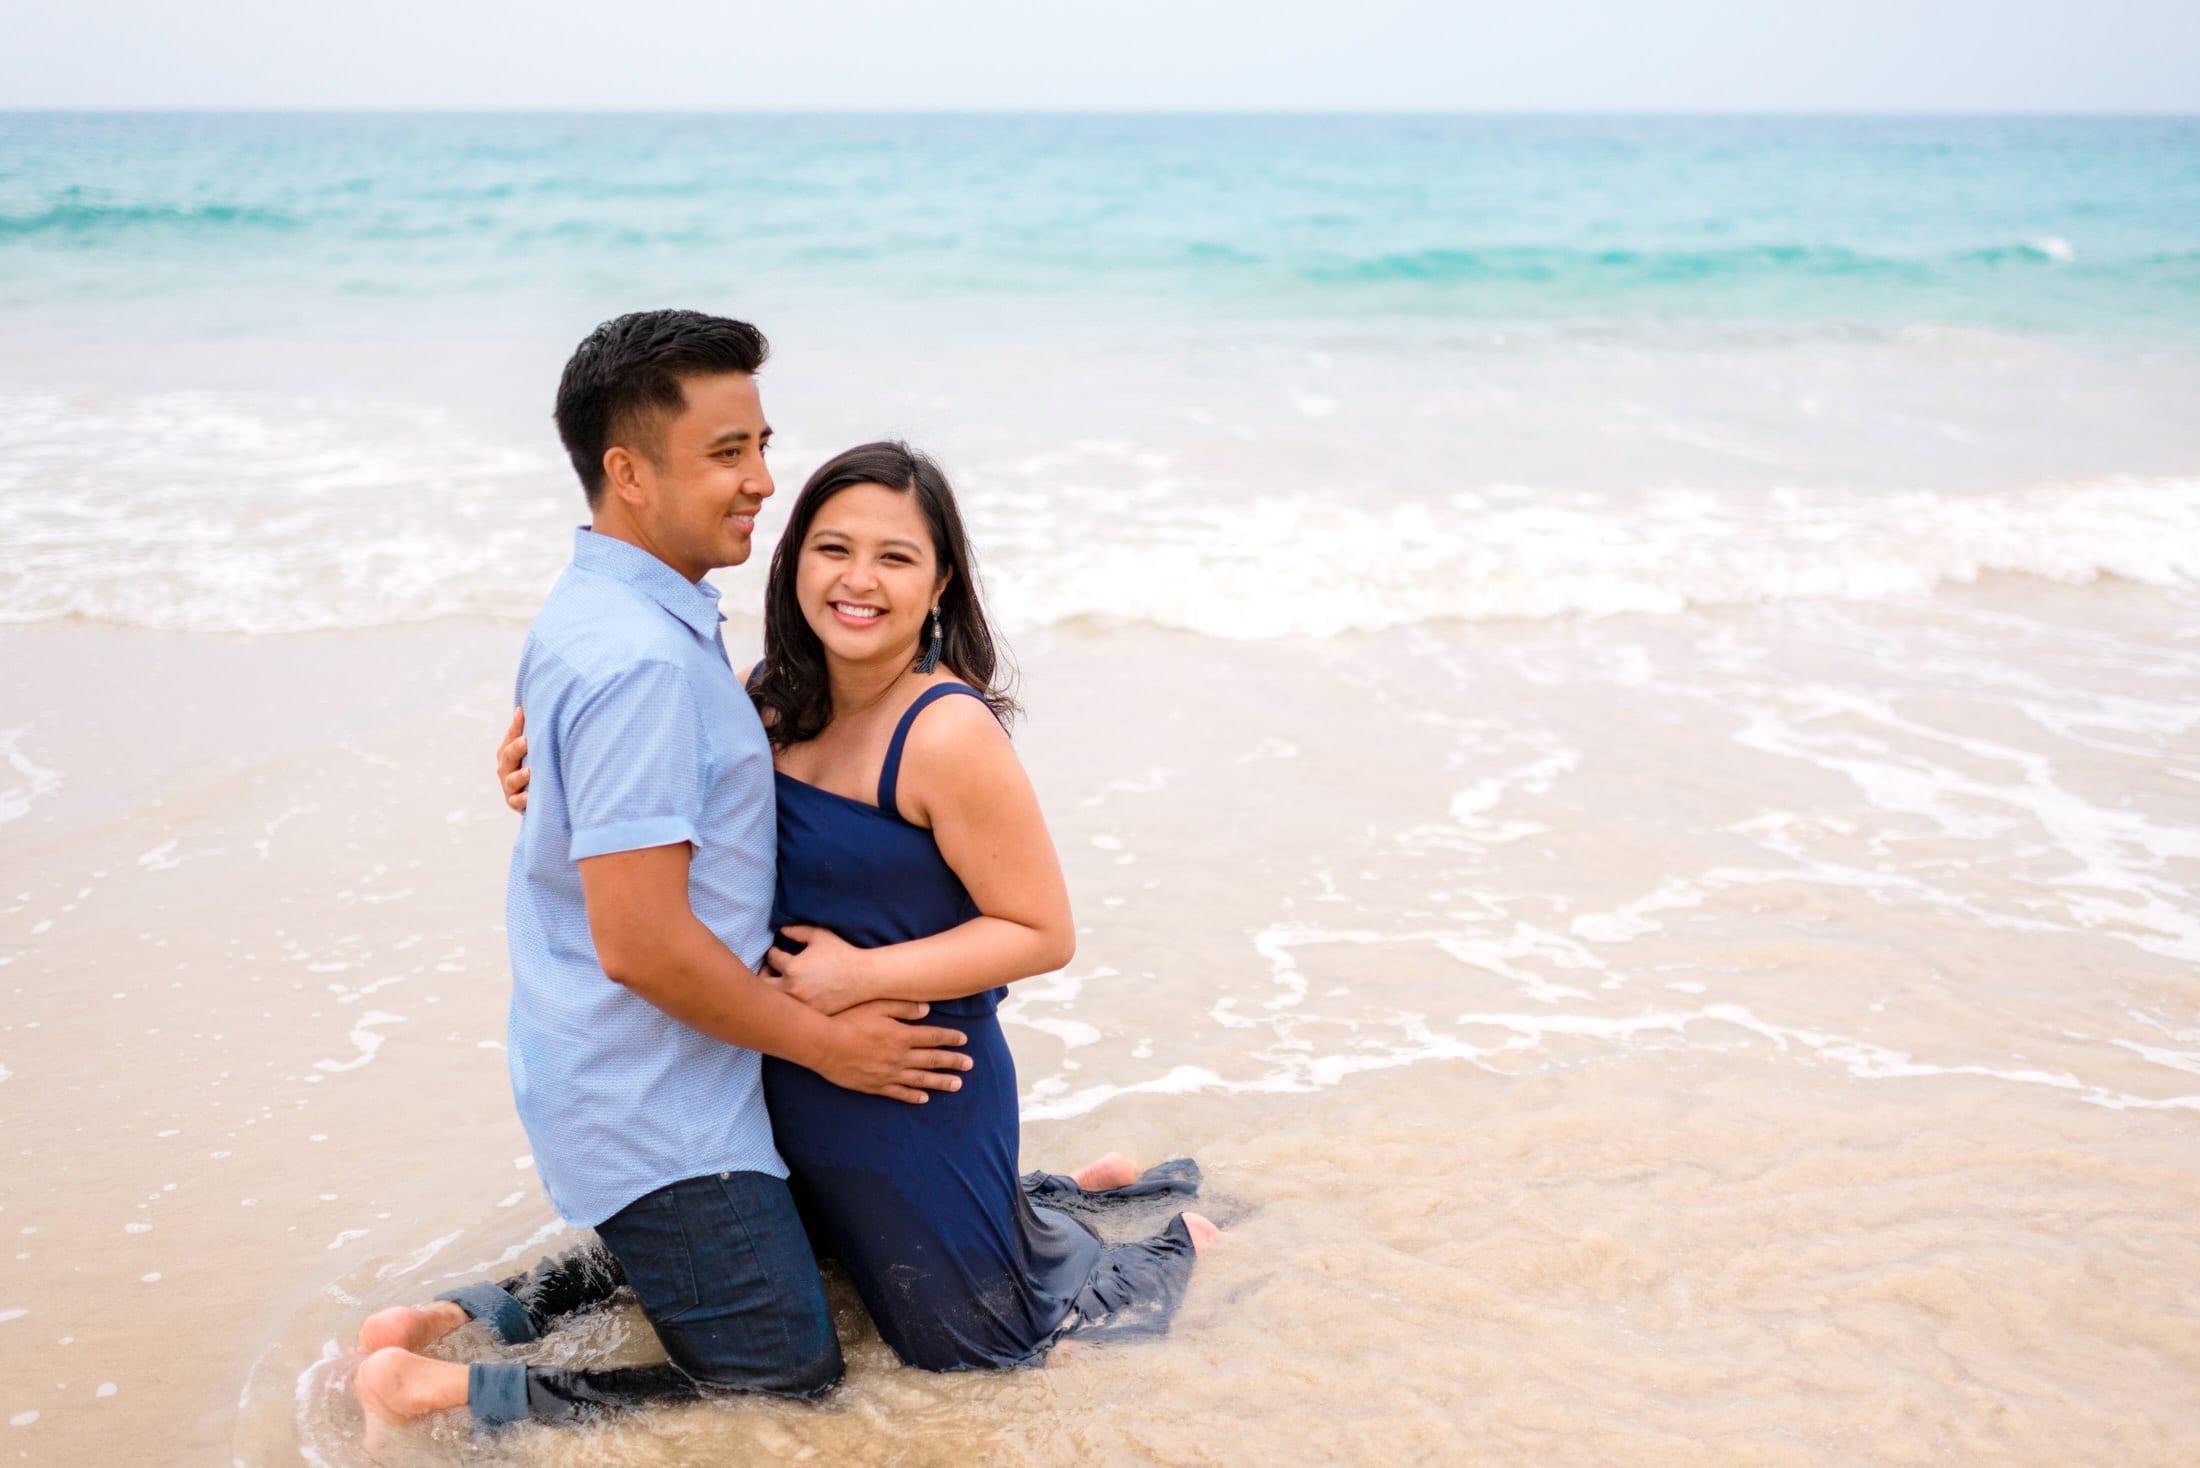 Hawaii-Cloudy-Maternity-Photographer45-16.jpg